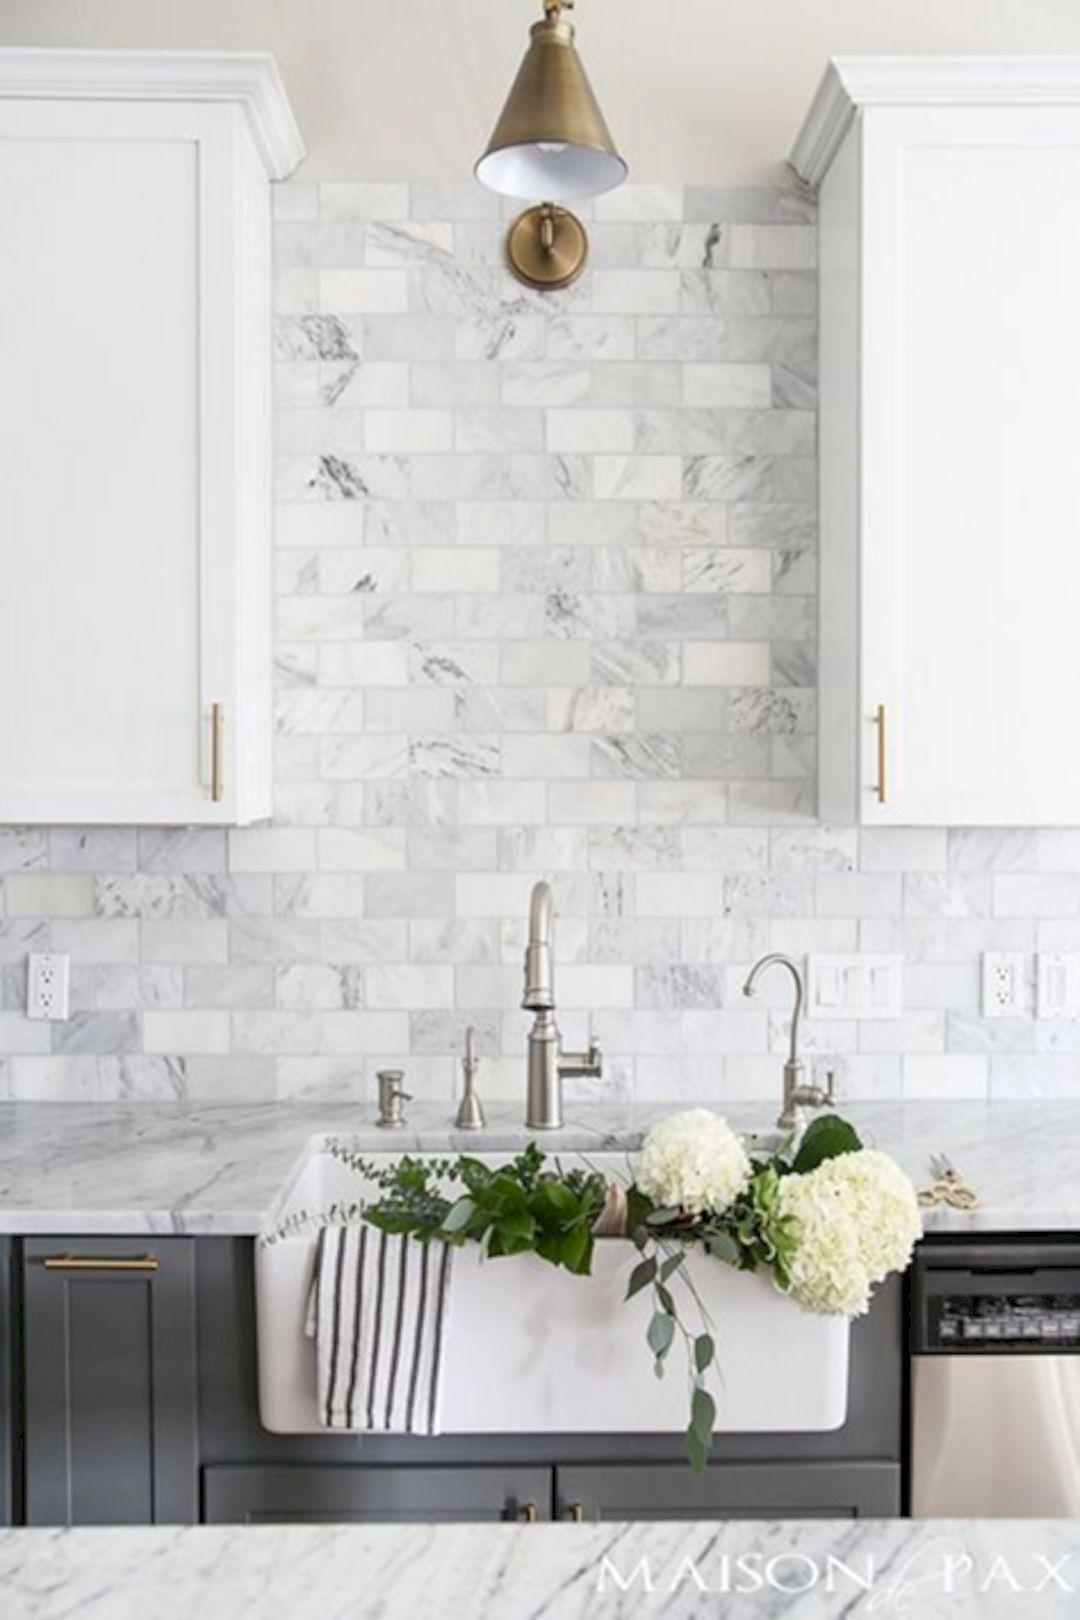 34 beautiful modern farmhouse kitchen sink designs new apartment rh pinterest com Vintage Double Drainboard Kitchen Sink Vintage Double Drainboard Kitchen Sink